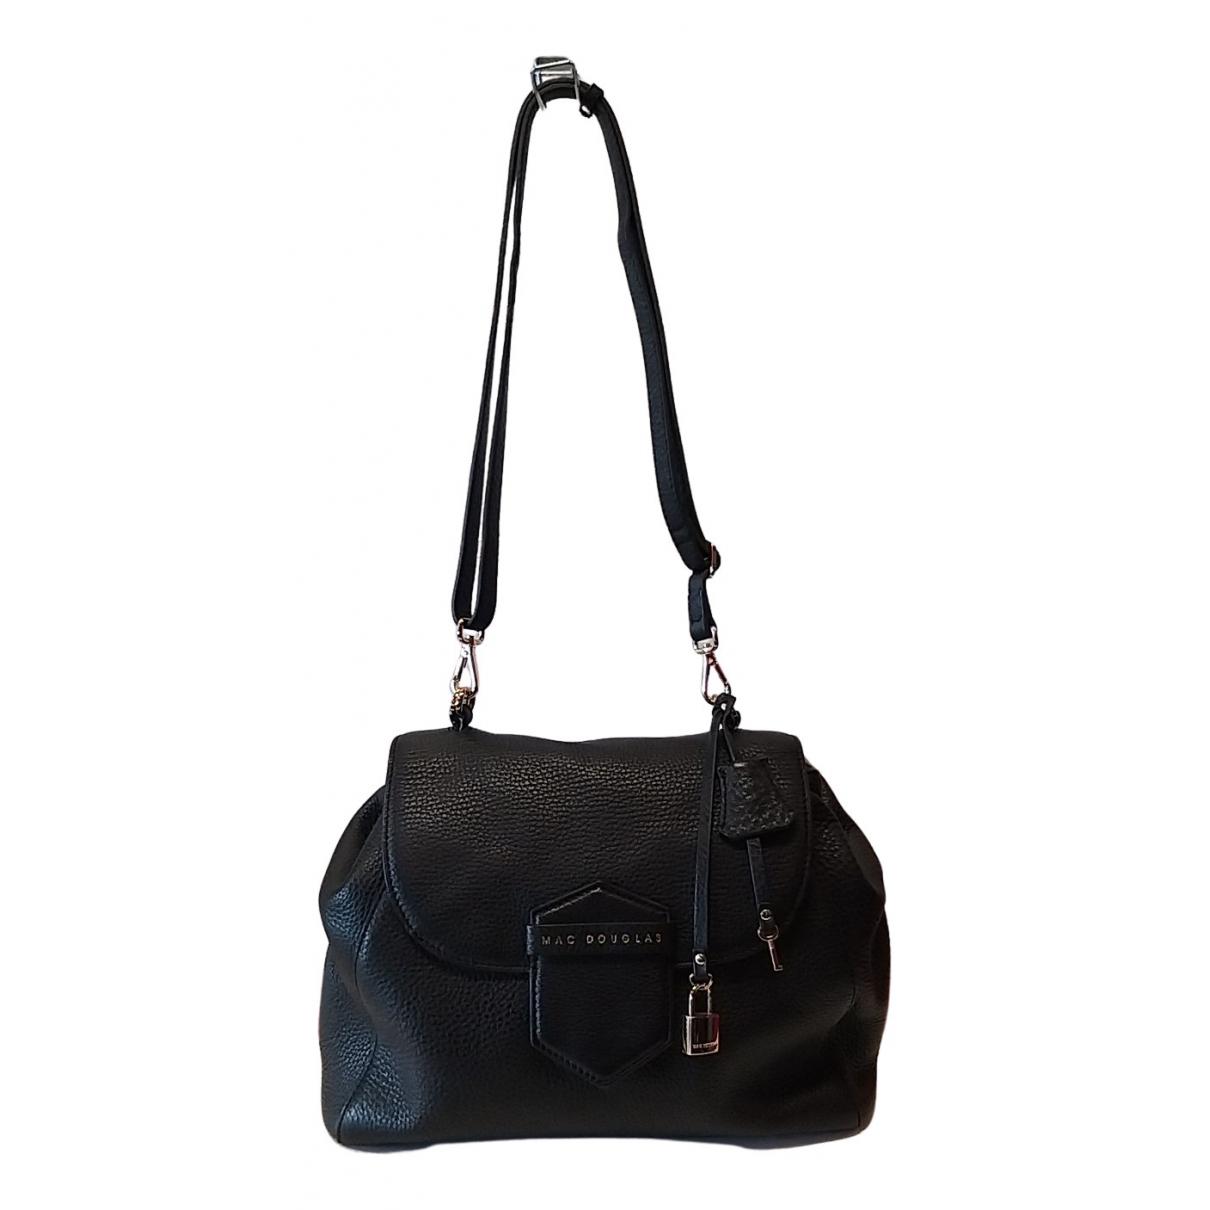 Mac Douglas N Black Leather handbag for Women N